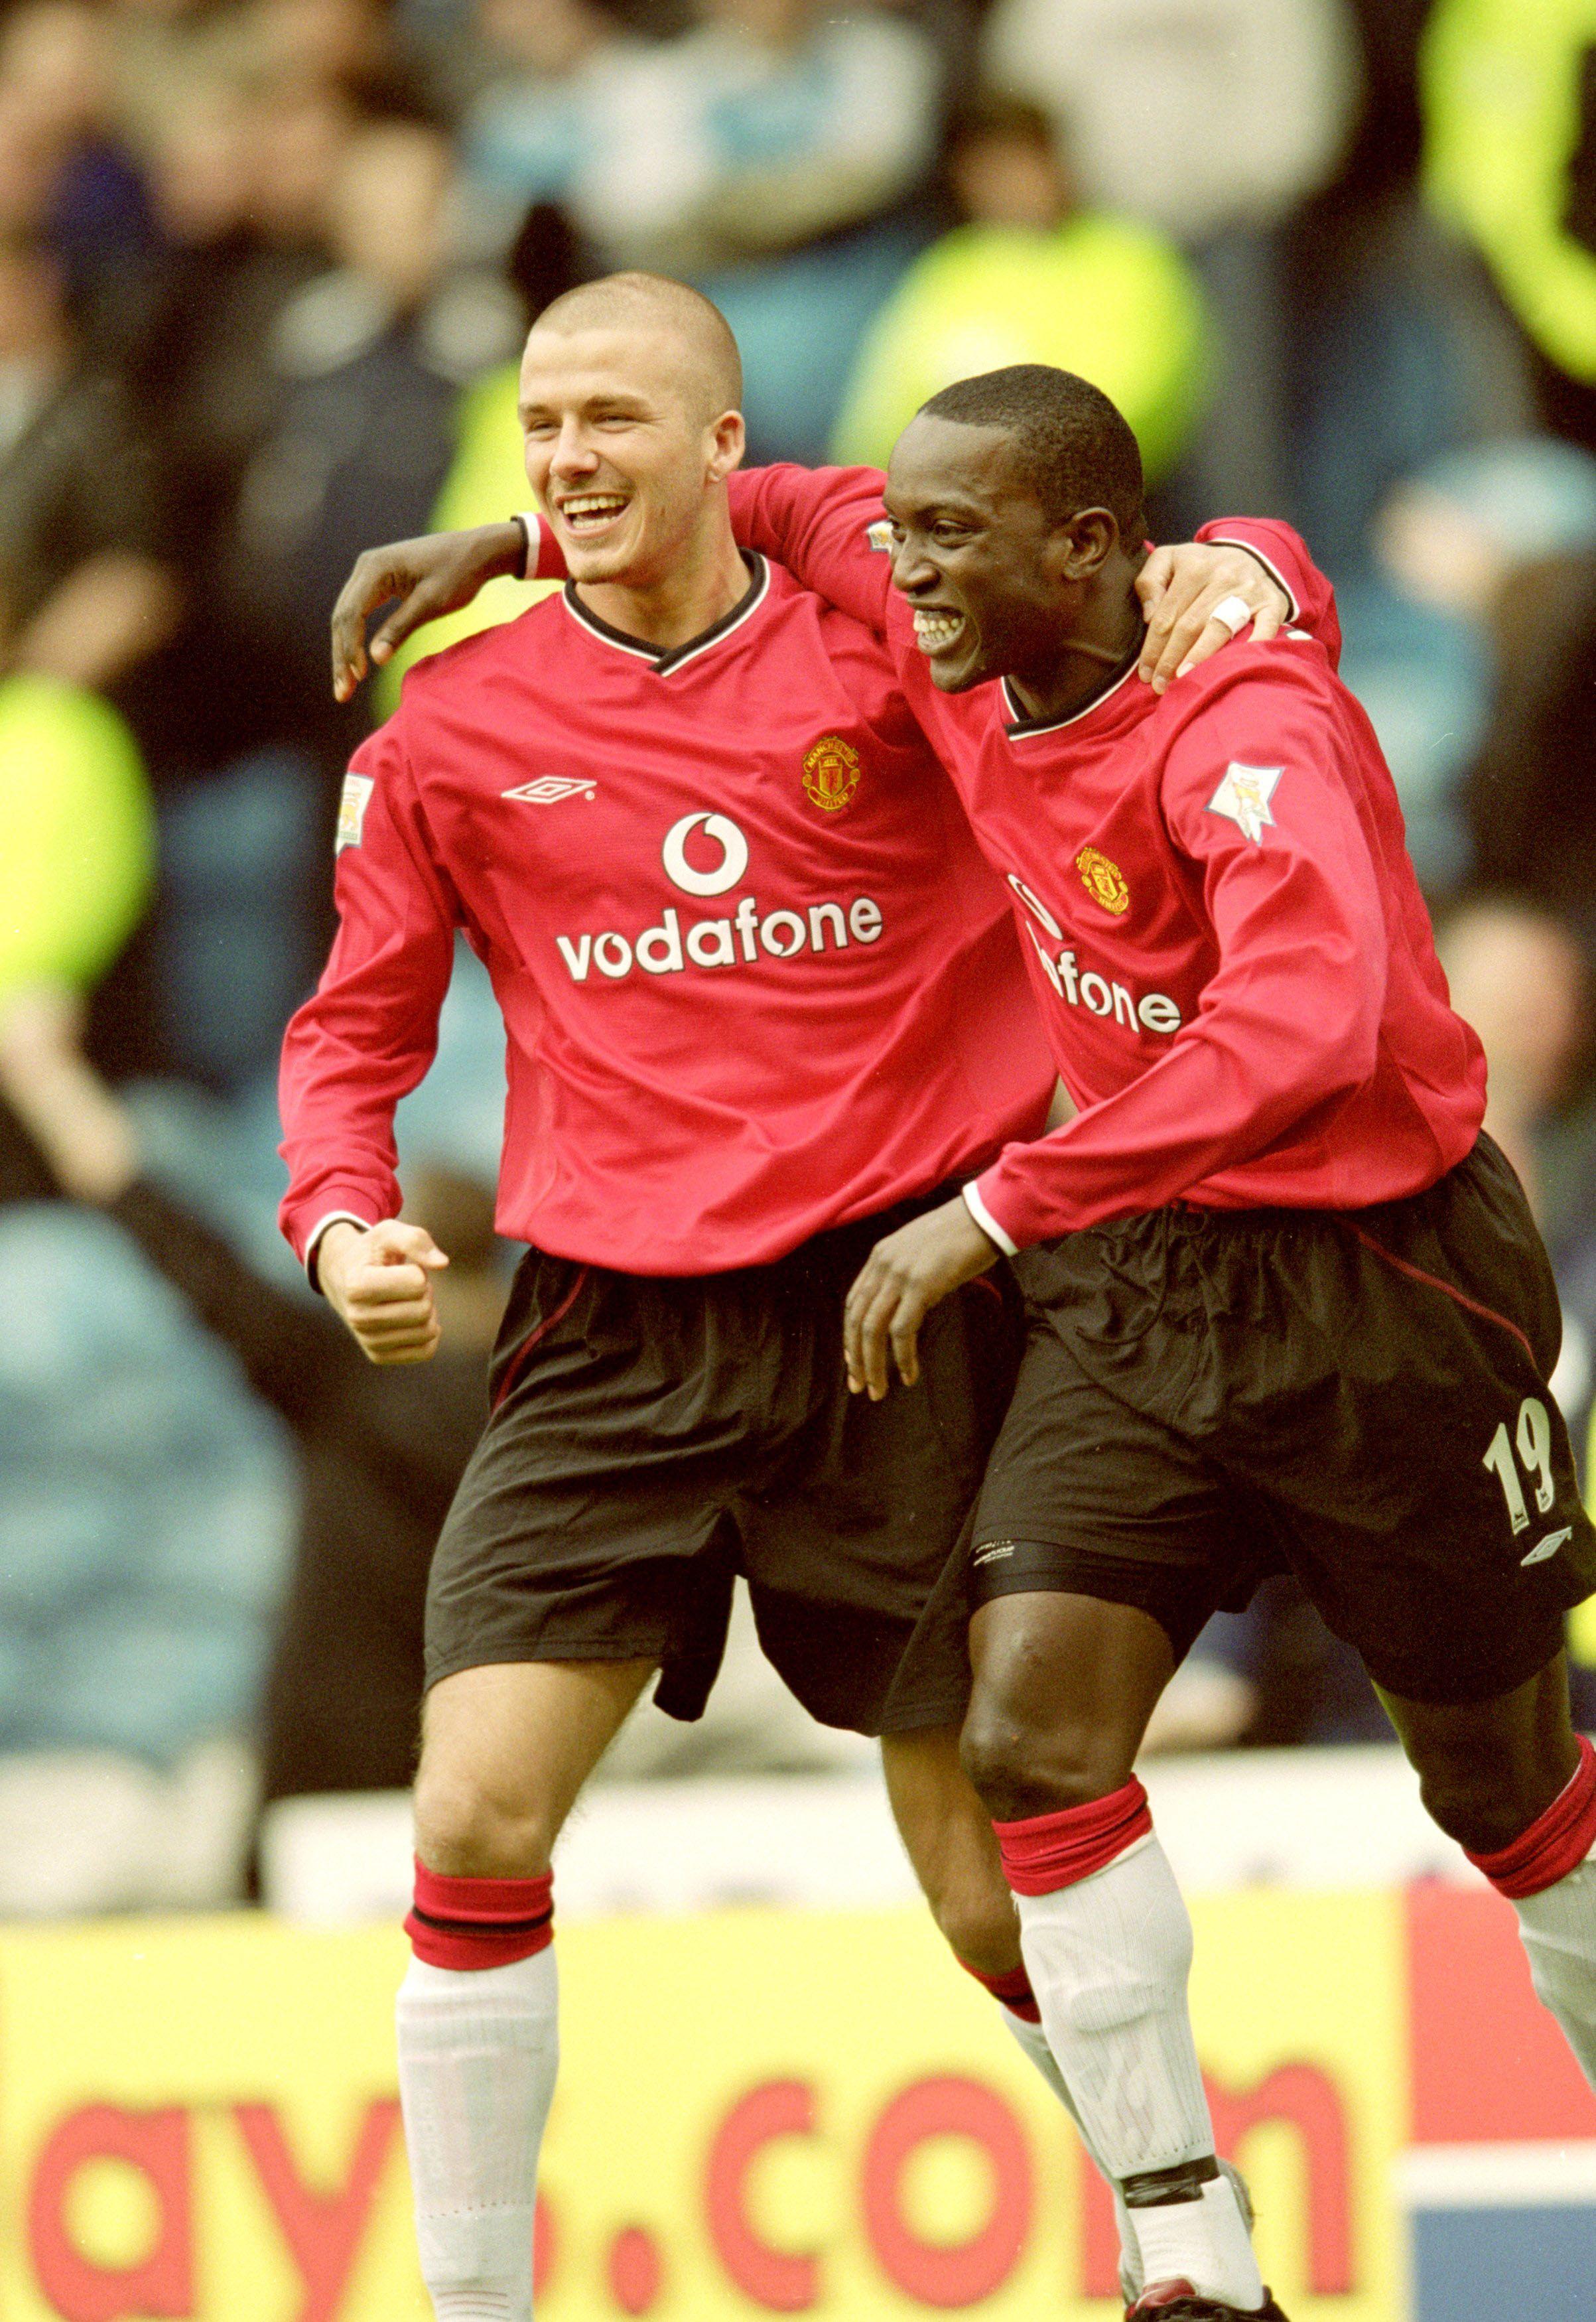 Beckham and Yorke Manchester united legends, Manchester